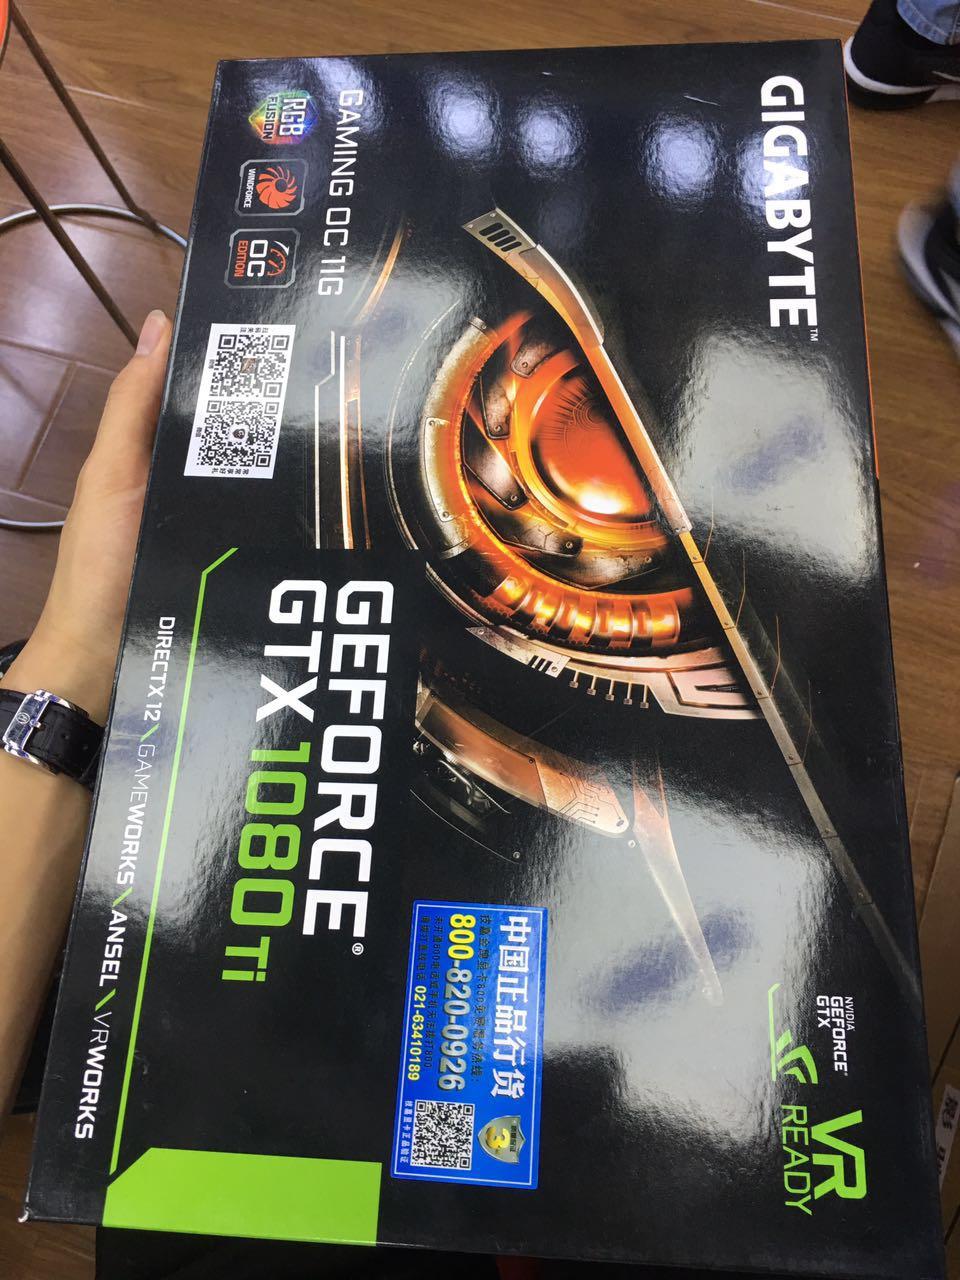 Gigabyte nvidia geforce gtx 1080 ti gaming oc 11g 11 gb gddr5x 352 bit memory pci express 3